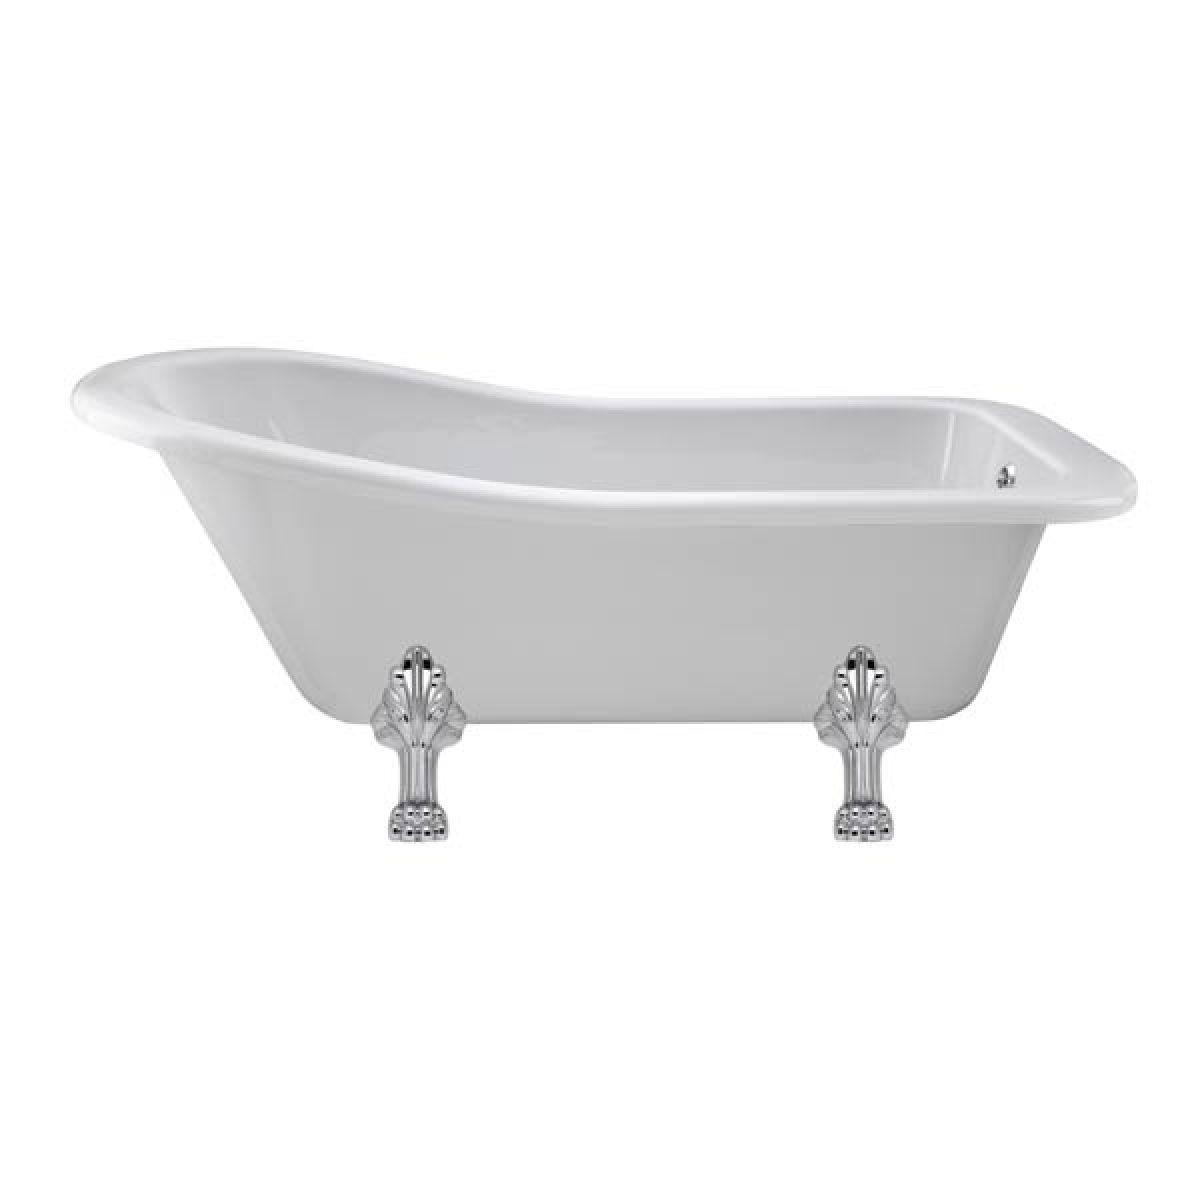 Premier Kensington Freestanding Slipper Bath with Pride Leg Set